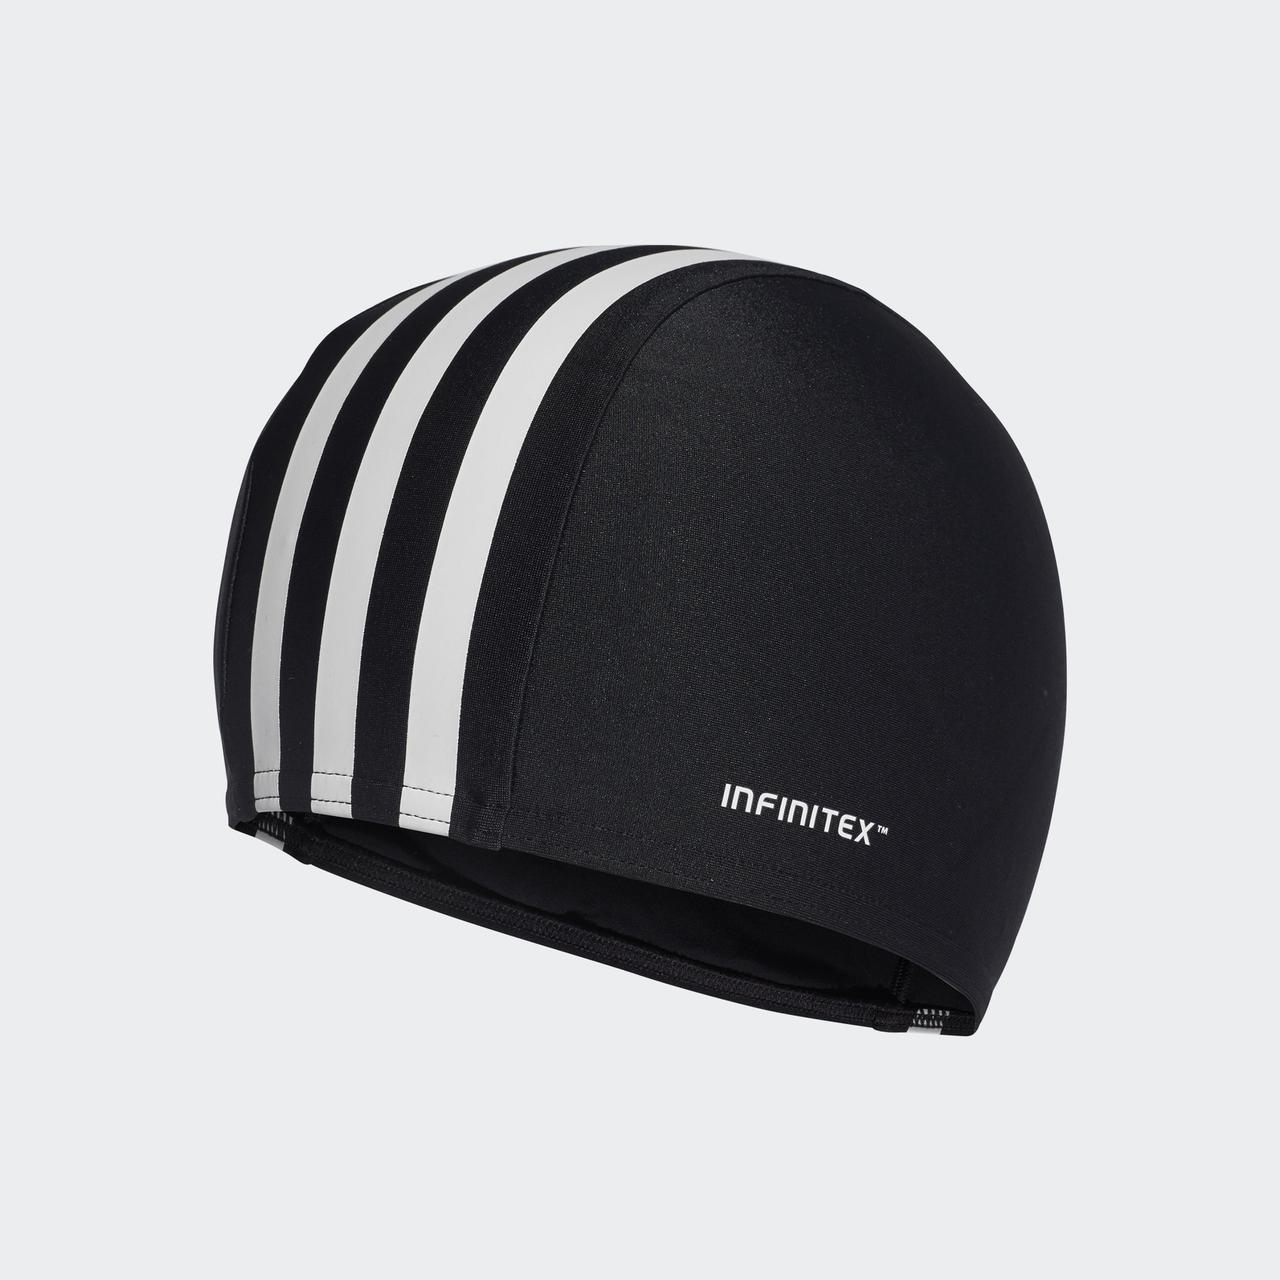 Мужская плавательная шапочка Adidas Performance Infinitex (Артикул: DN2494)